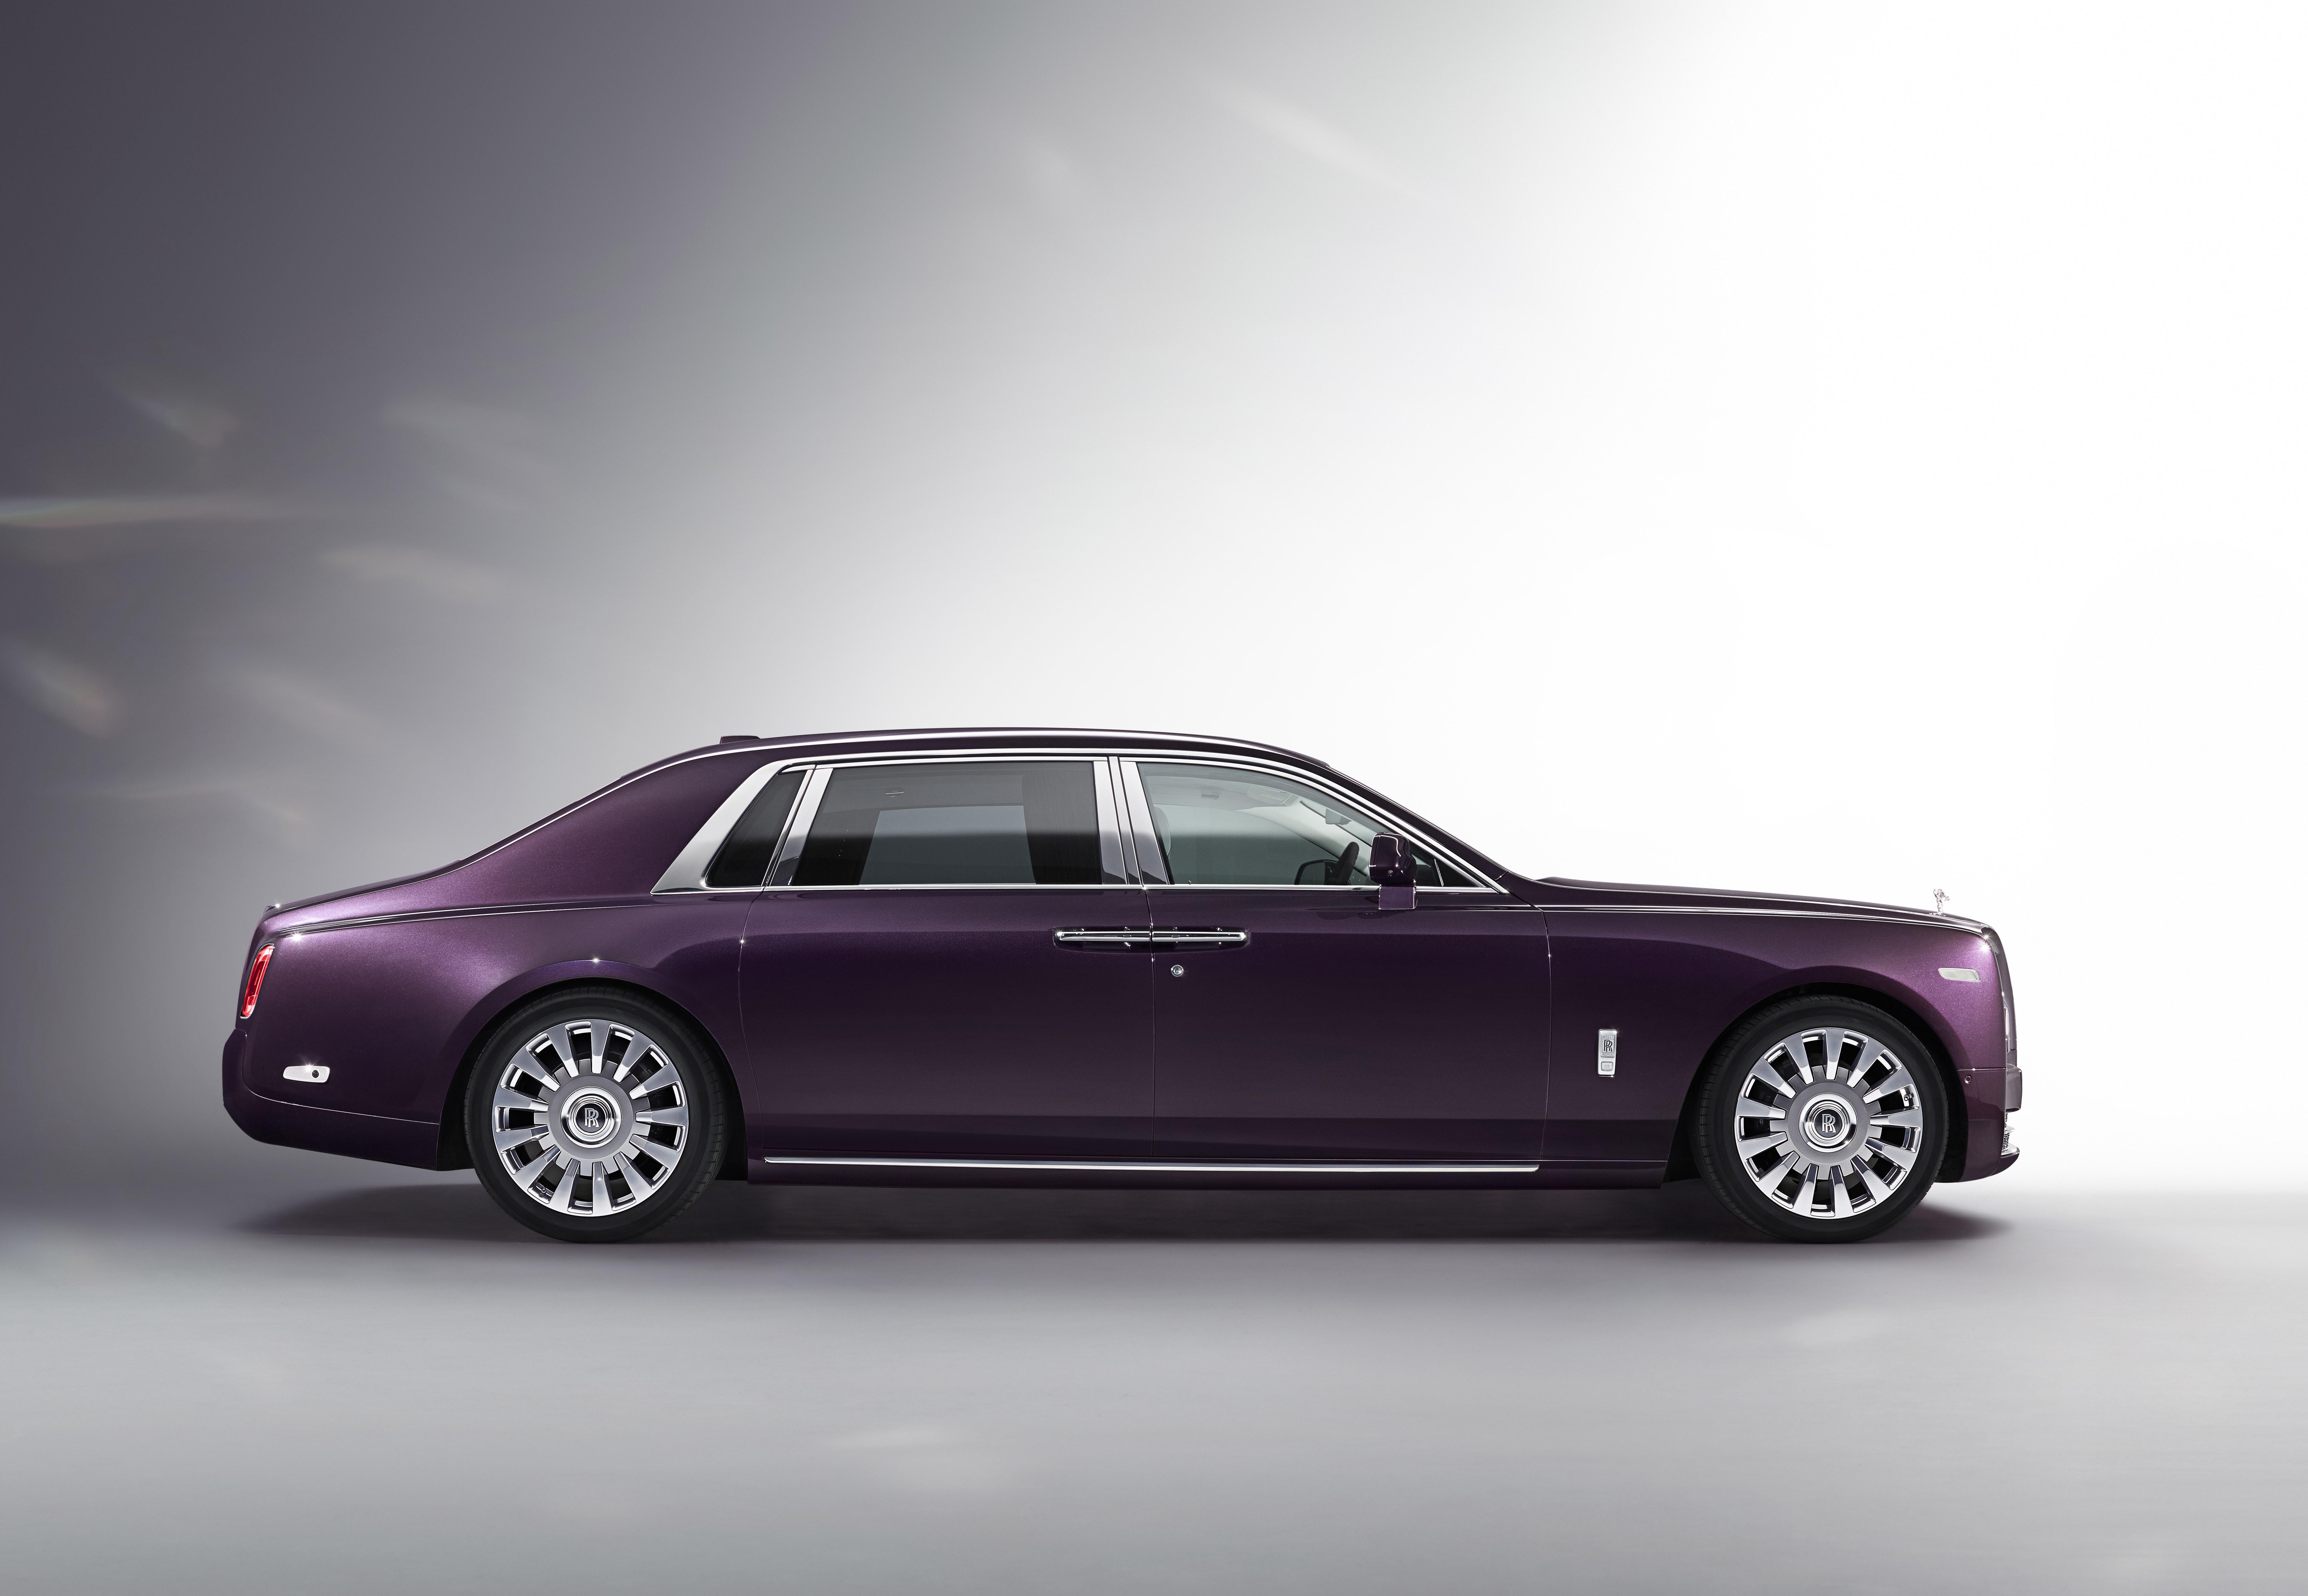 Rolls Royce's New Phantom VIII: The Best car in the world